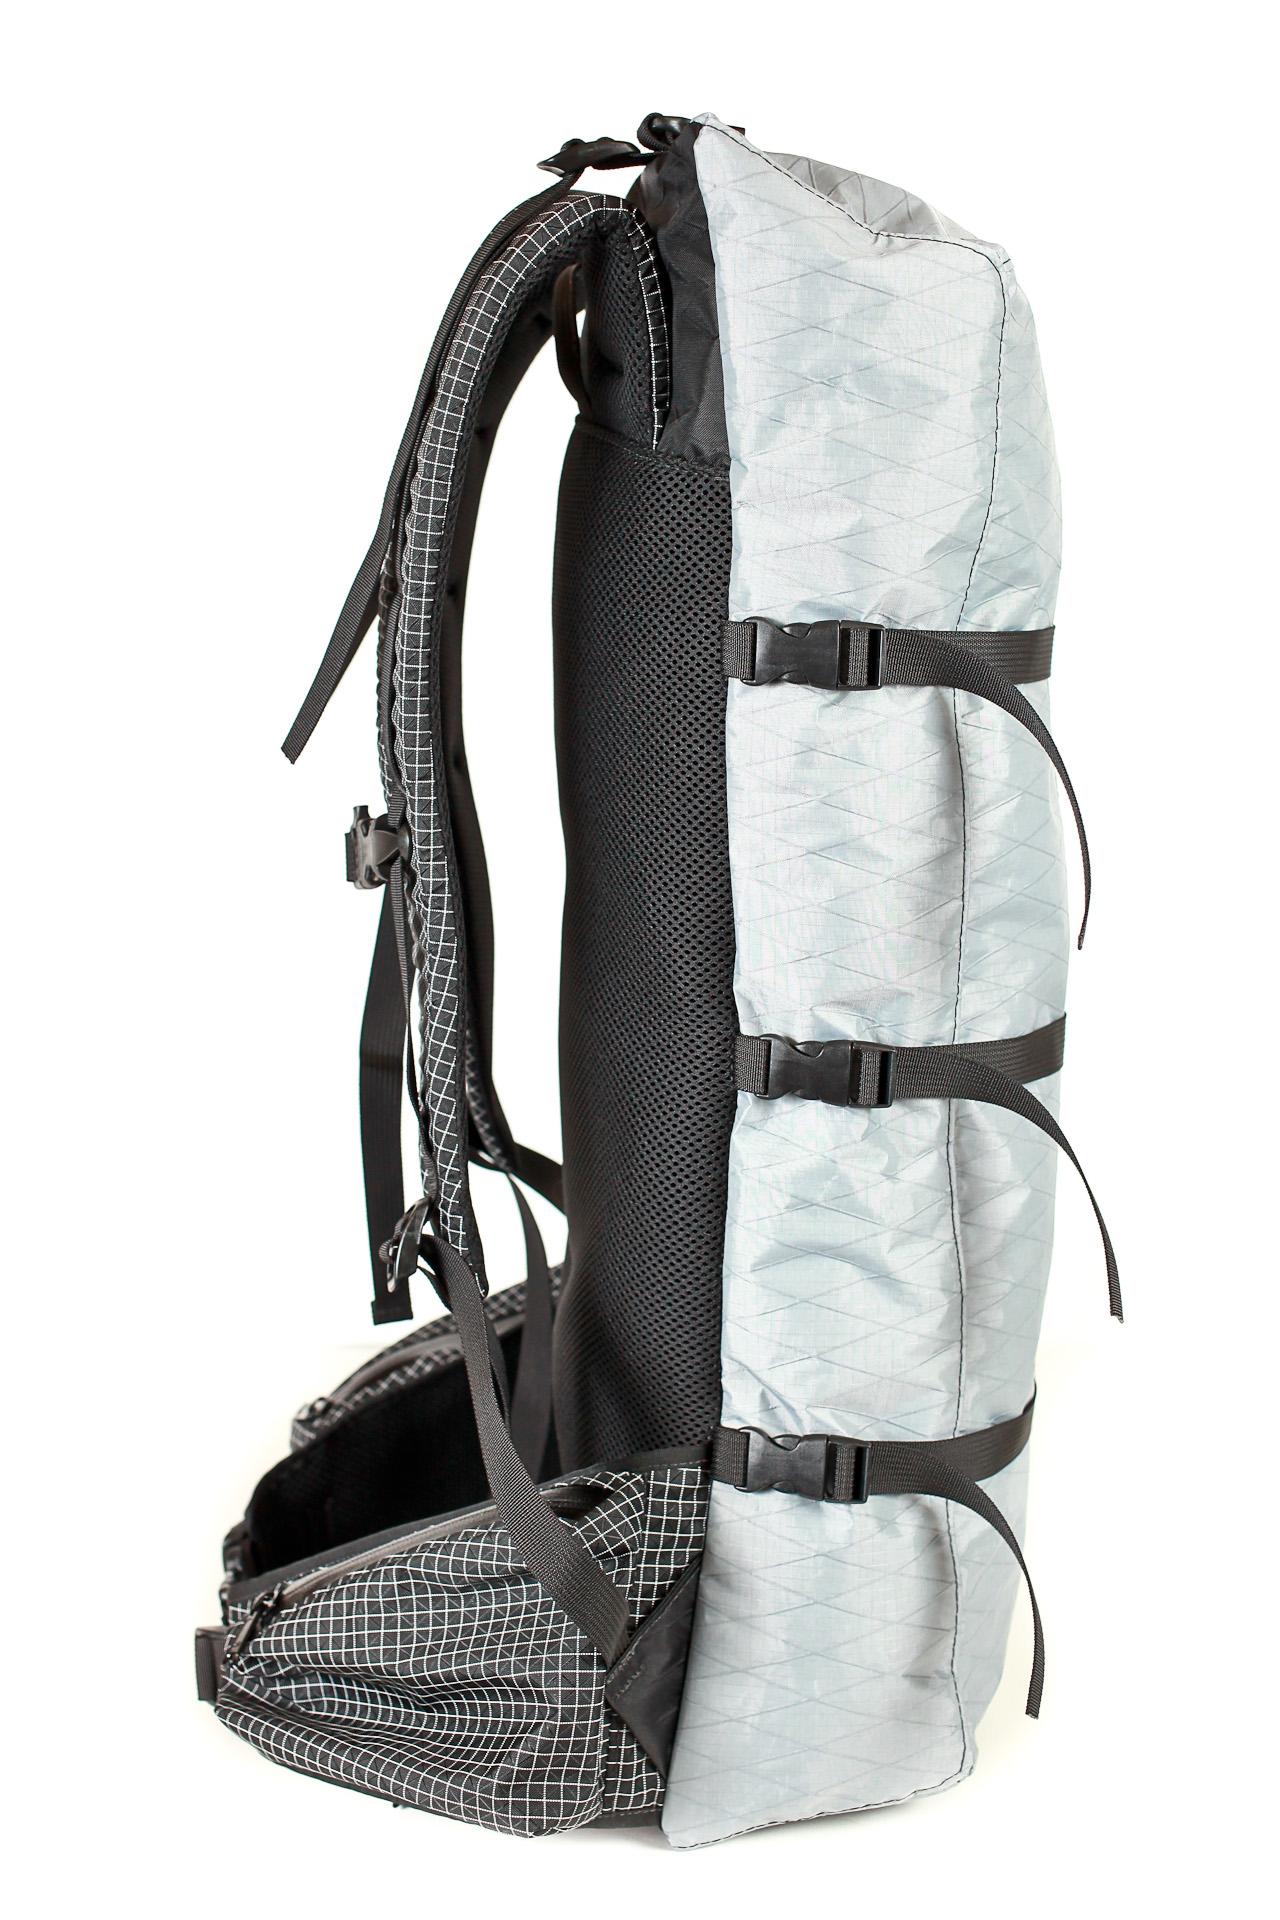 "Zimmerbuilt custom pack: 4"" deep"